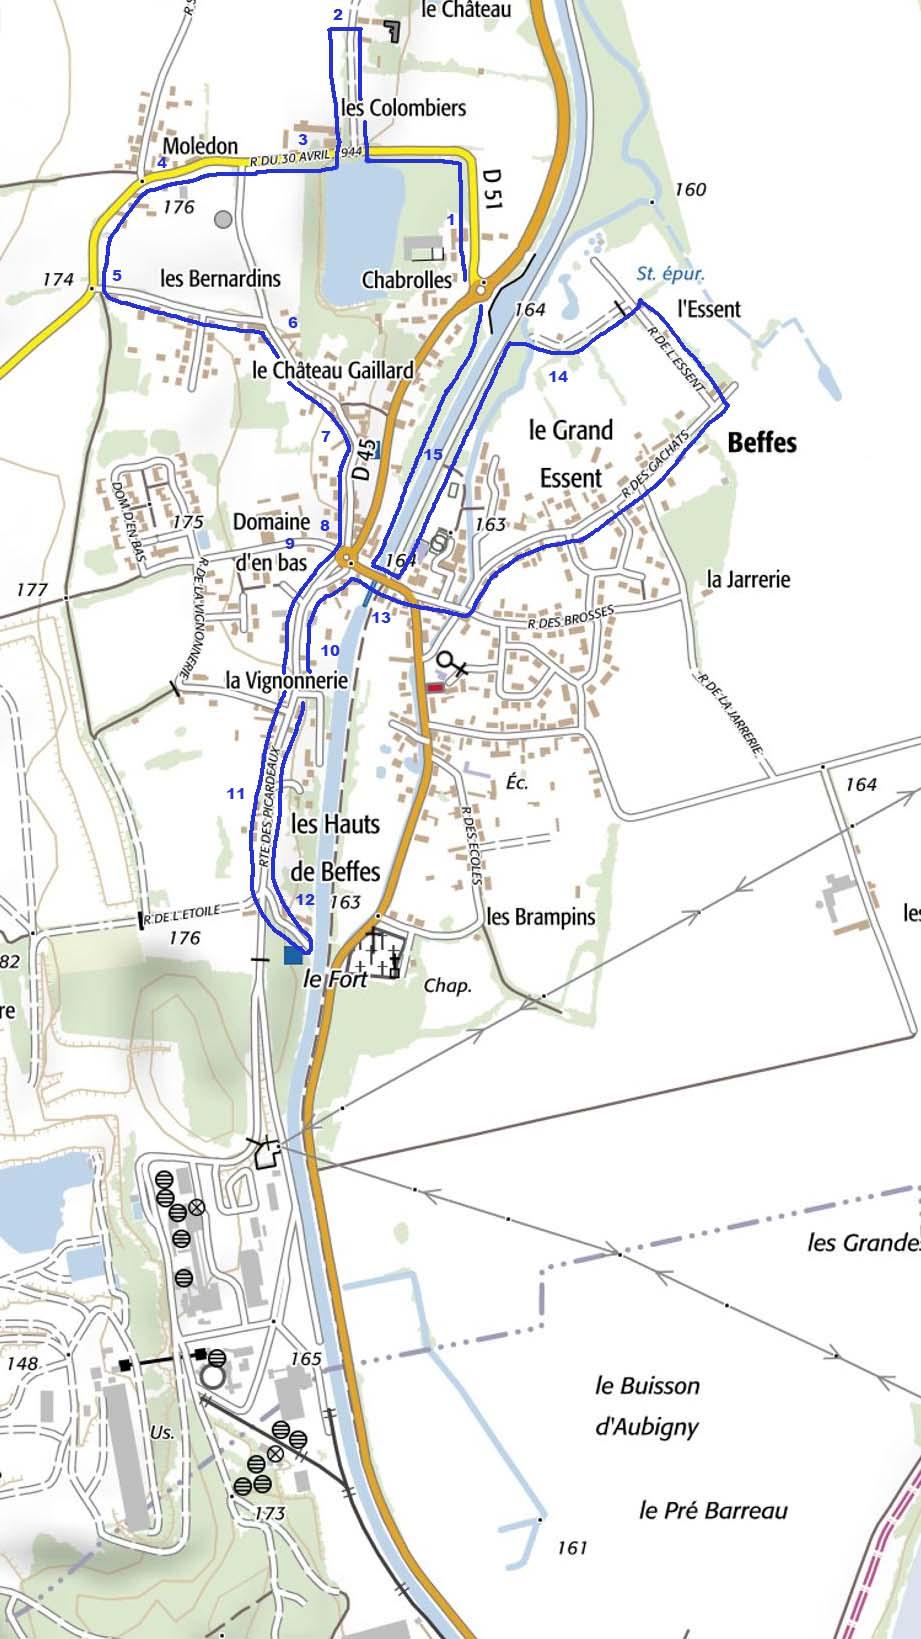 Plan beffes geoportail circuit 1